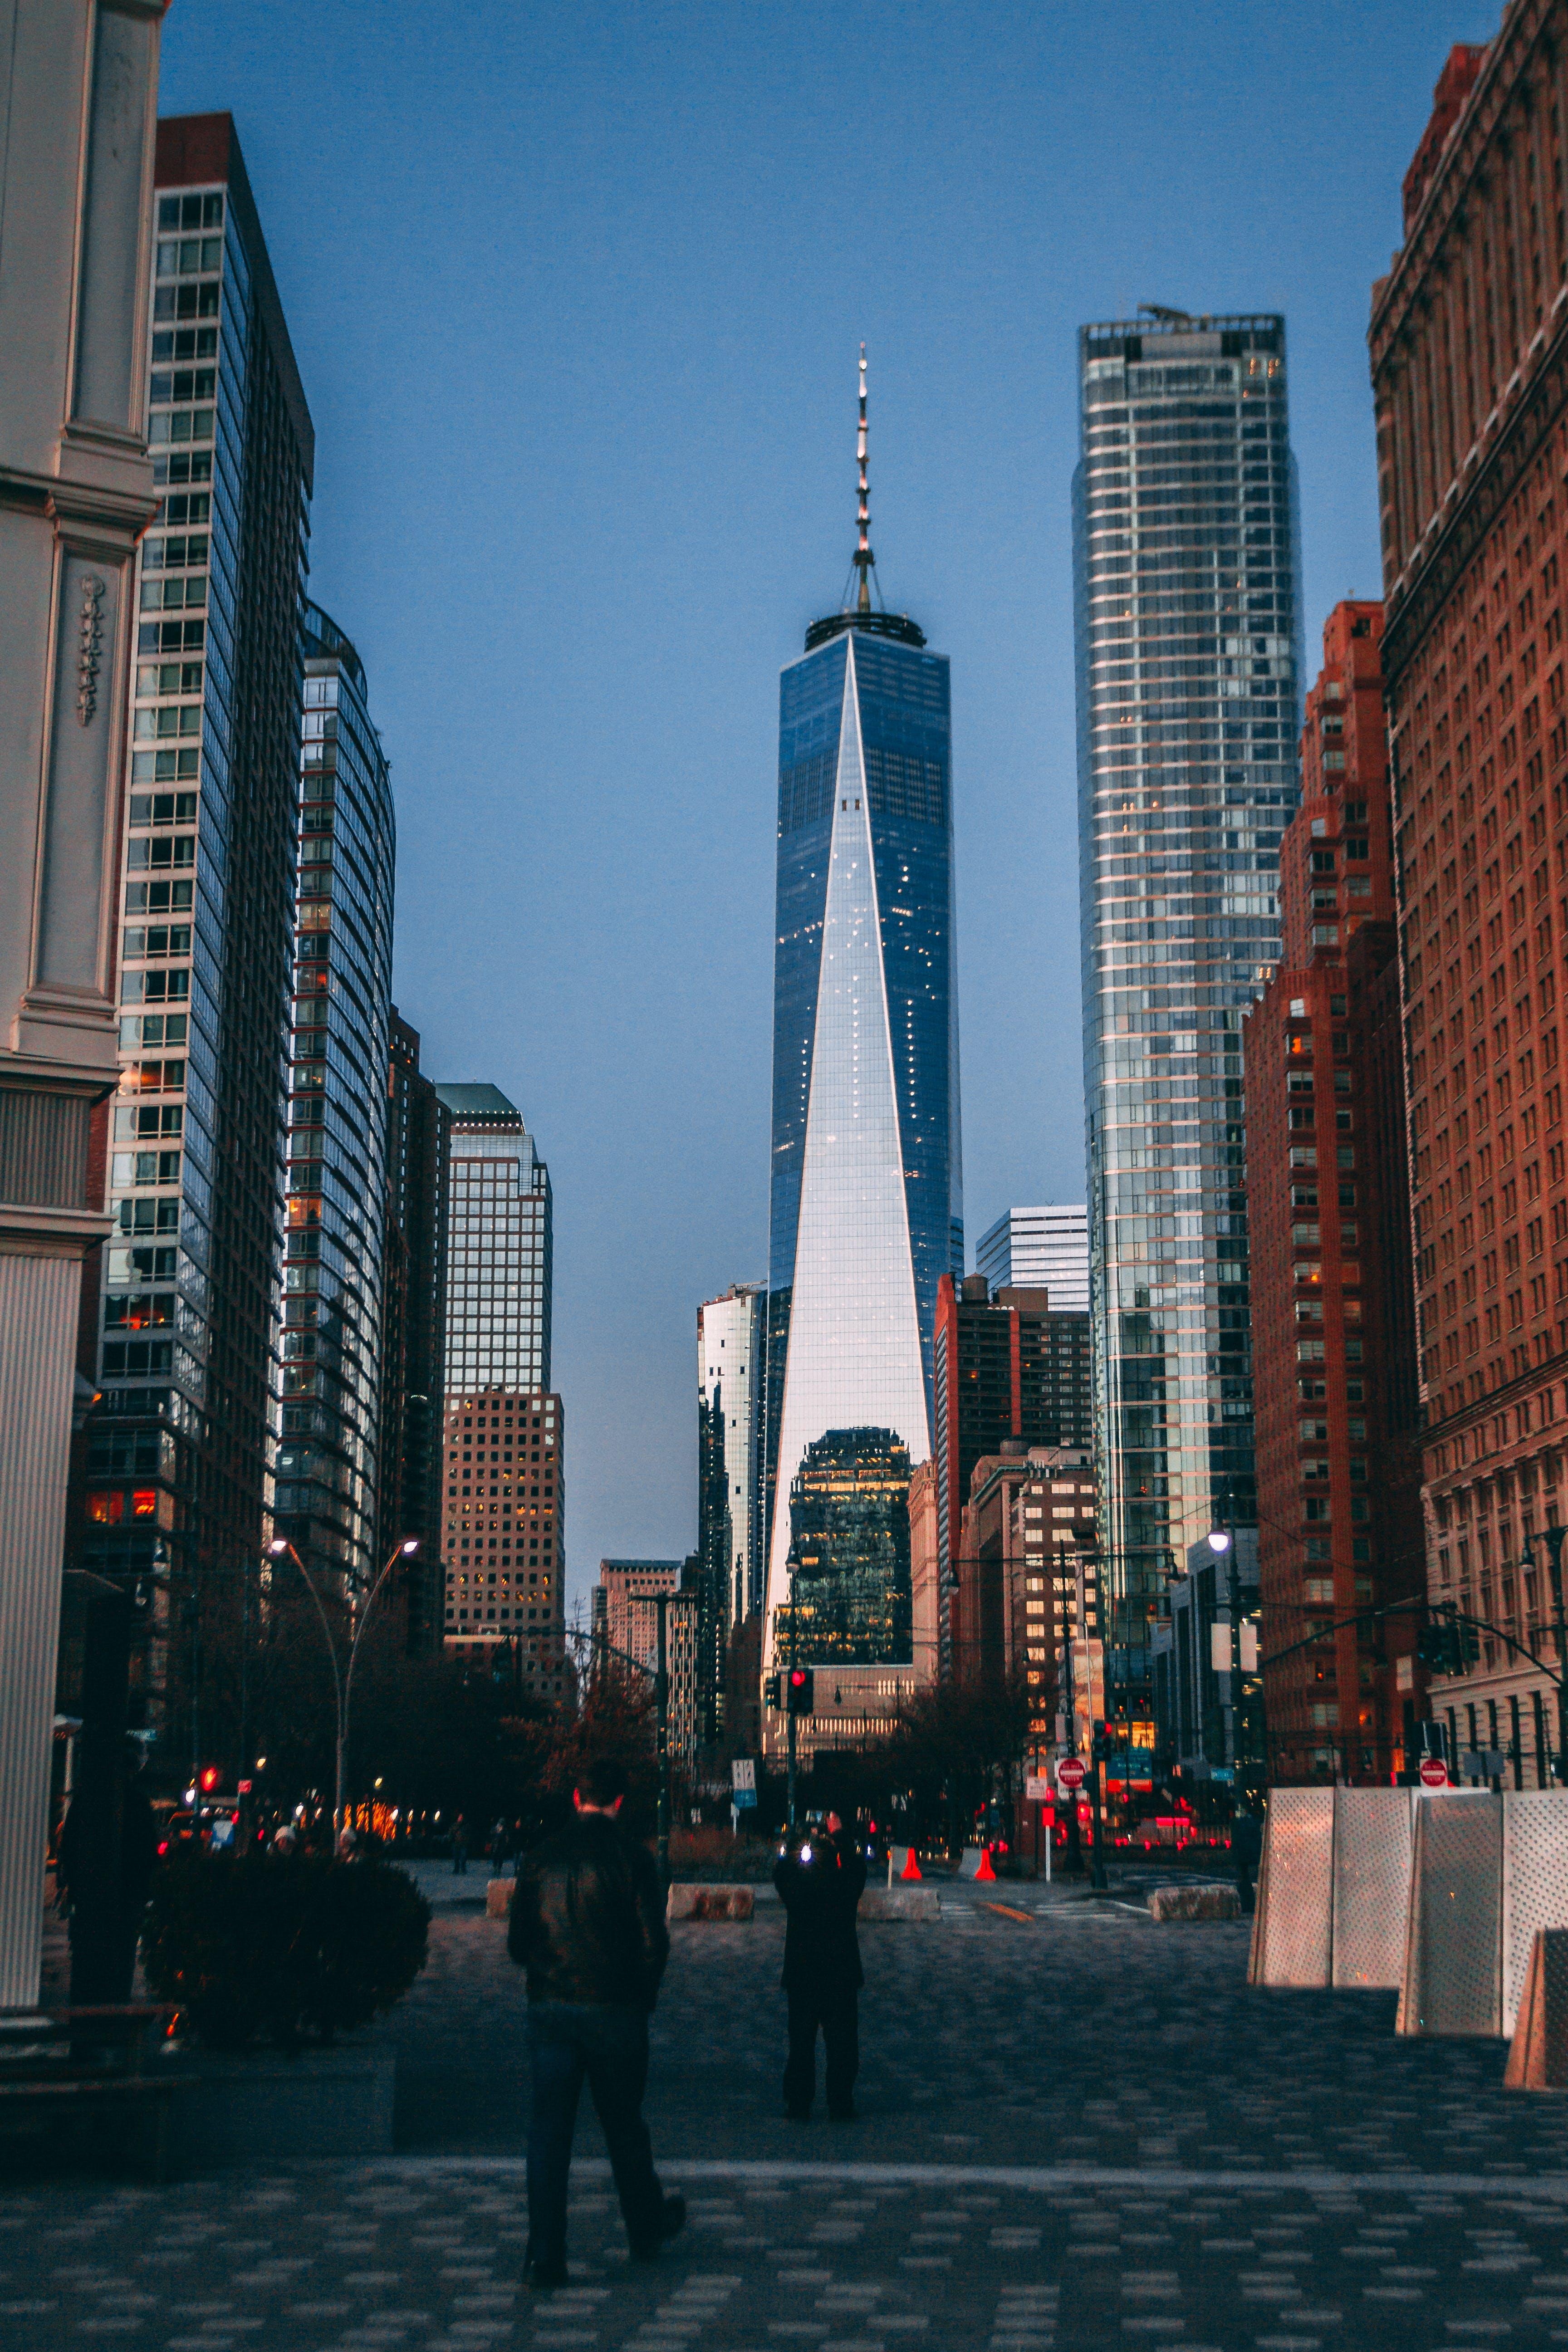 High Rise Building Under Blue Sky